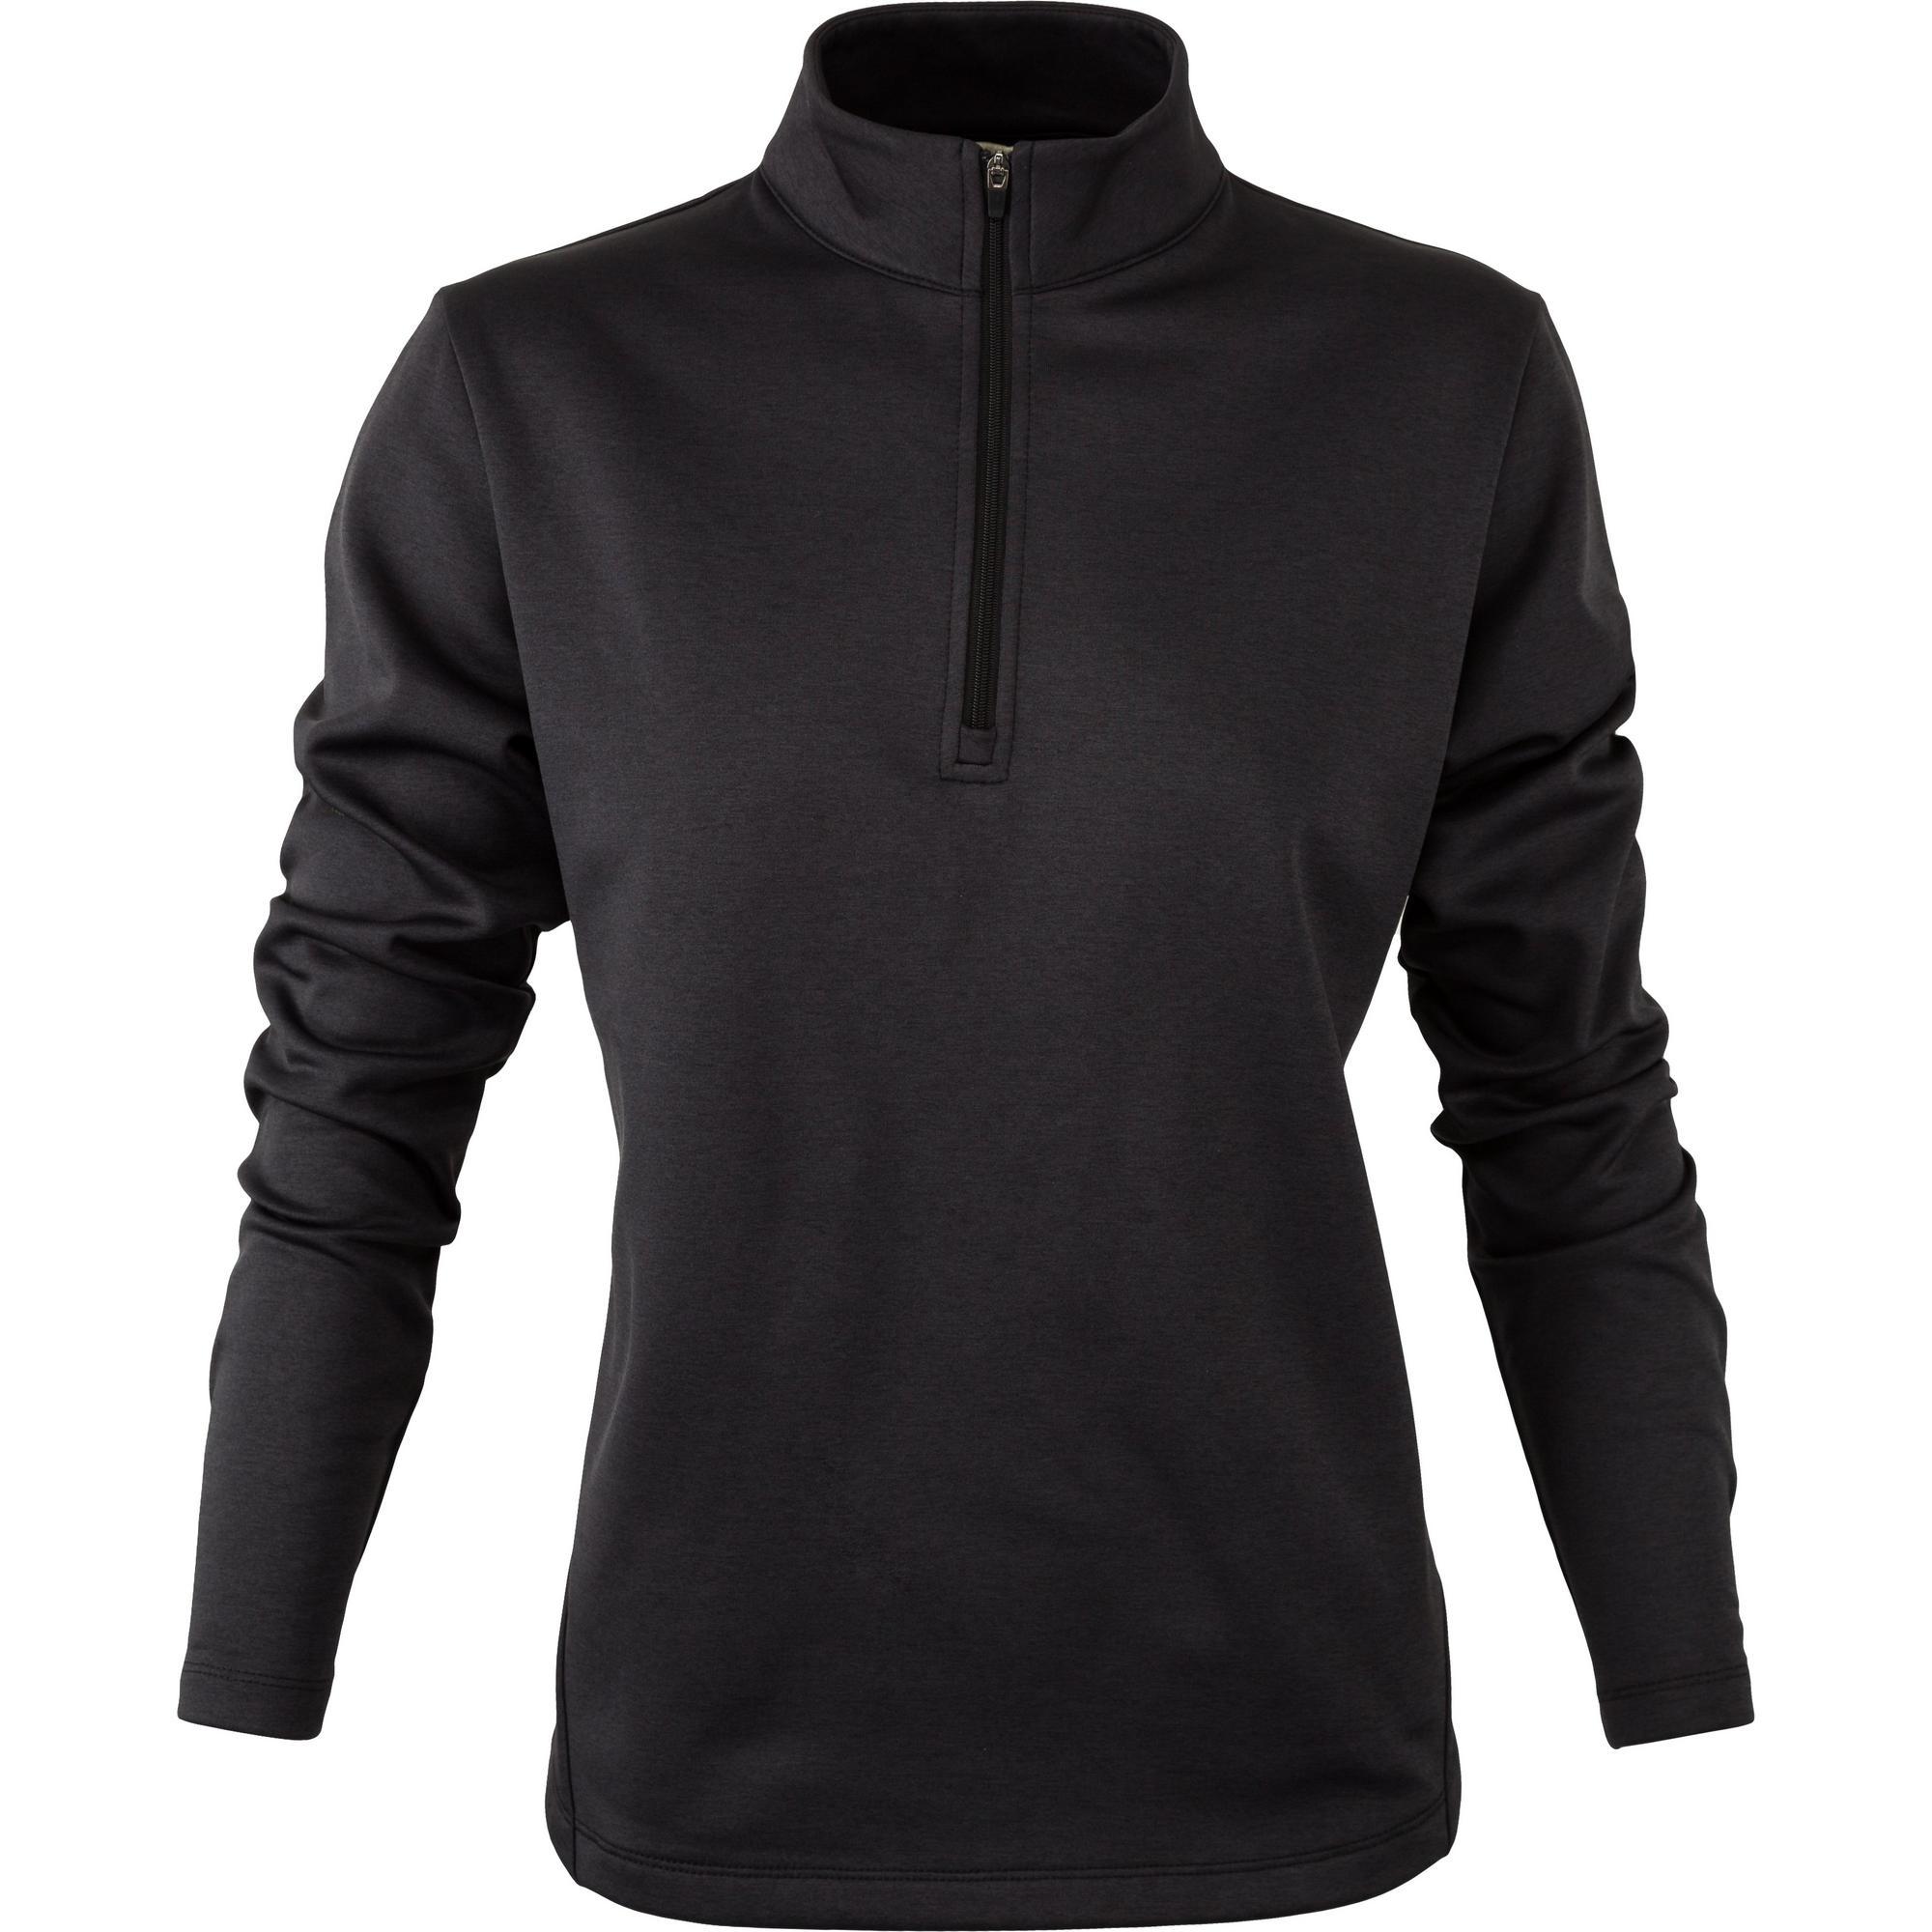 Women's Cozy Pullover Long Sleeve 1/4 Zip Sweater